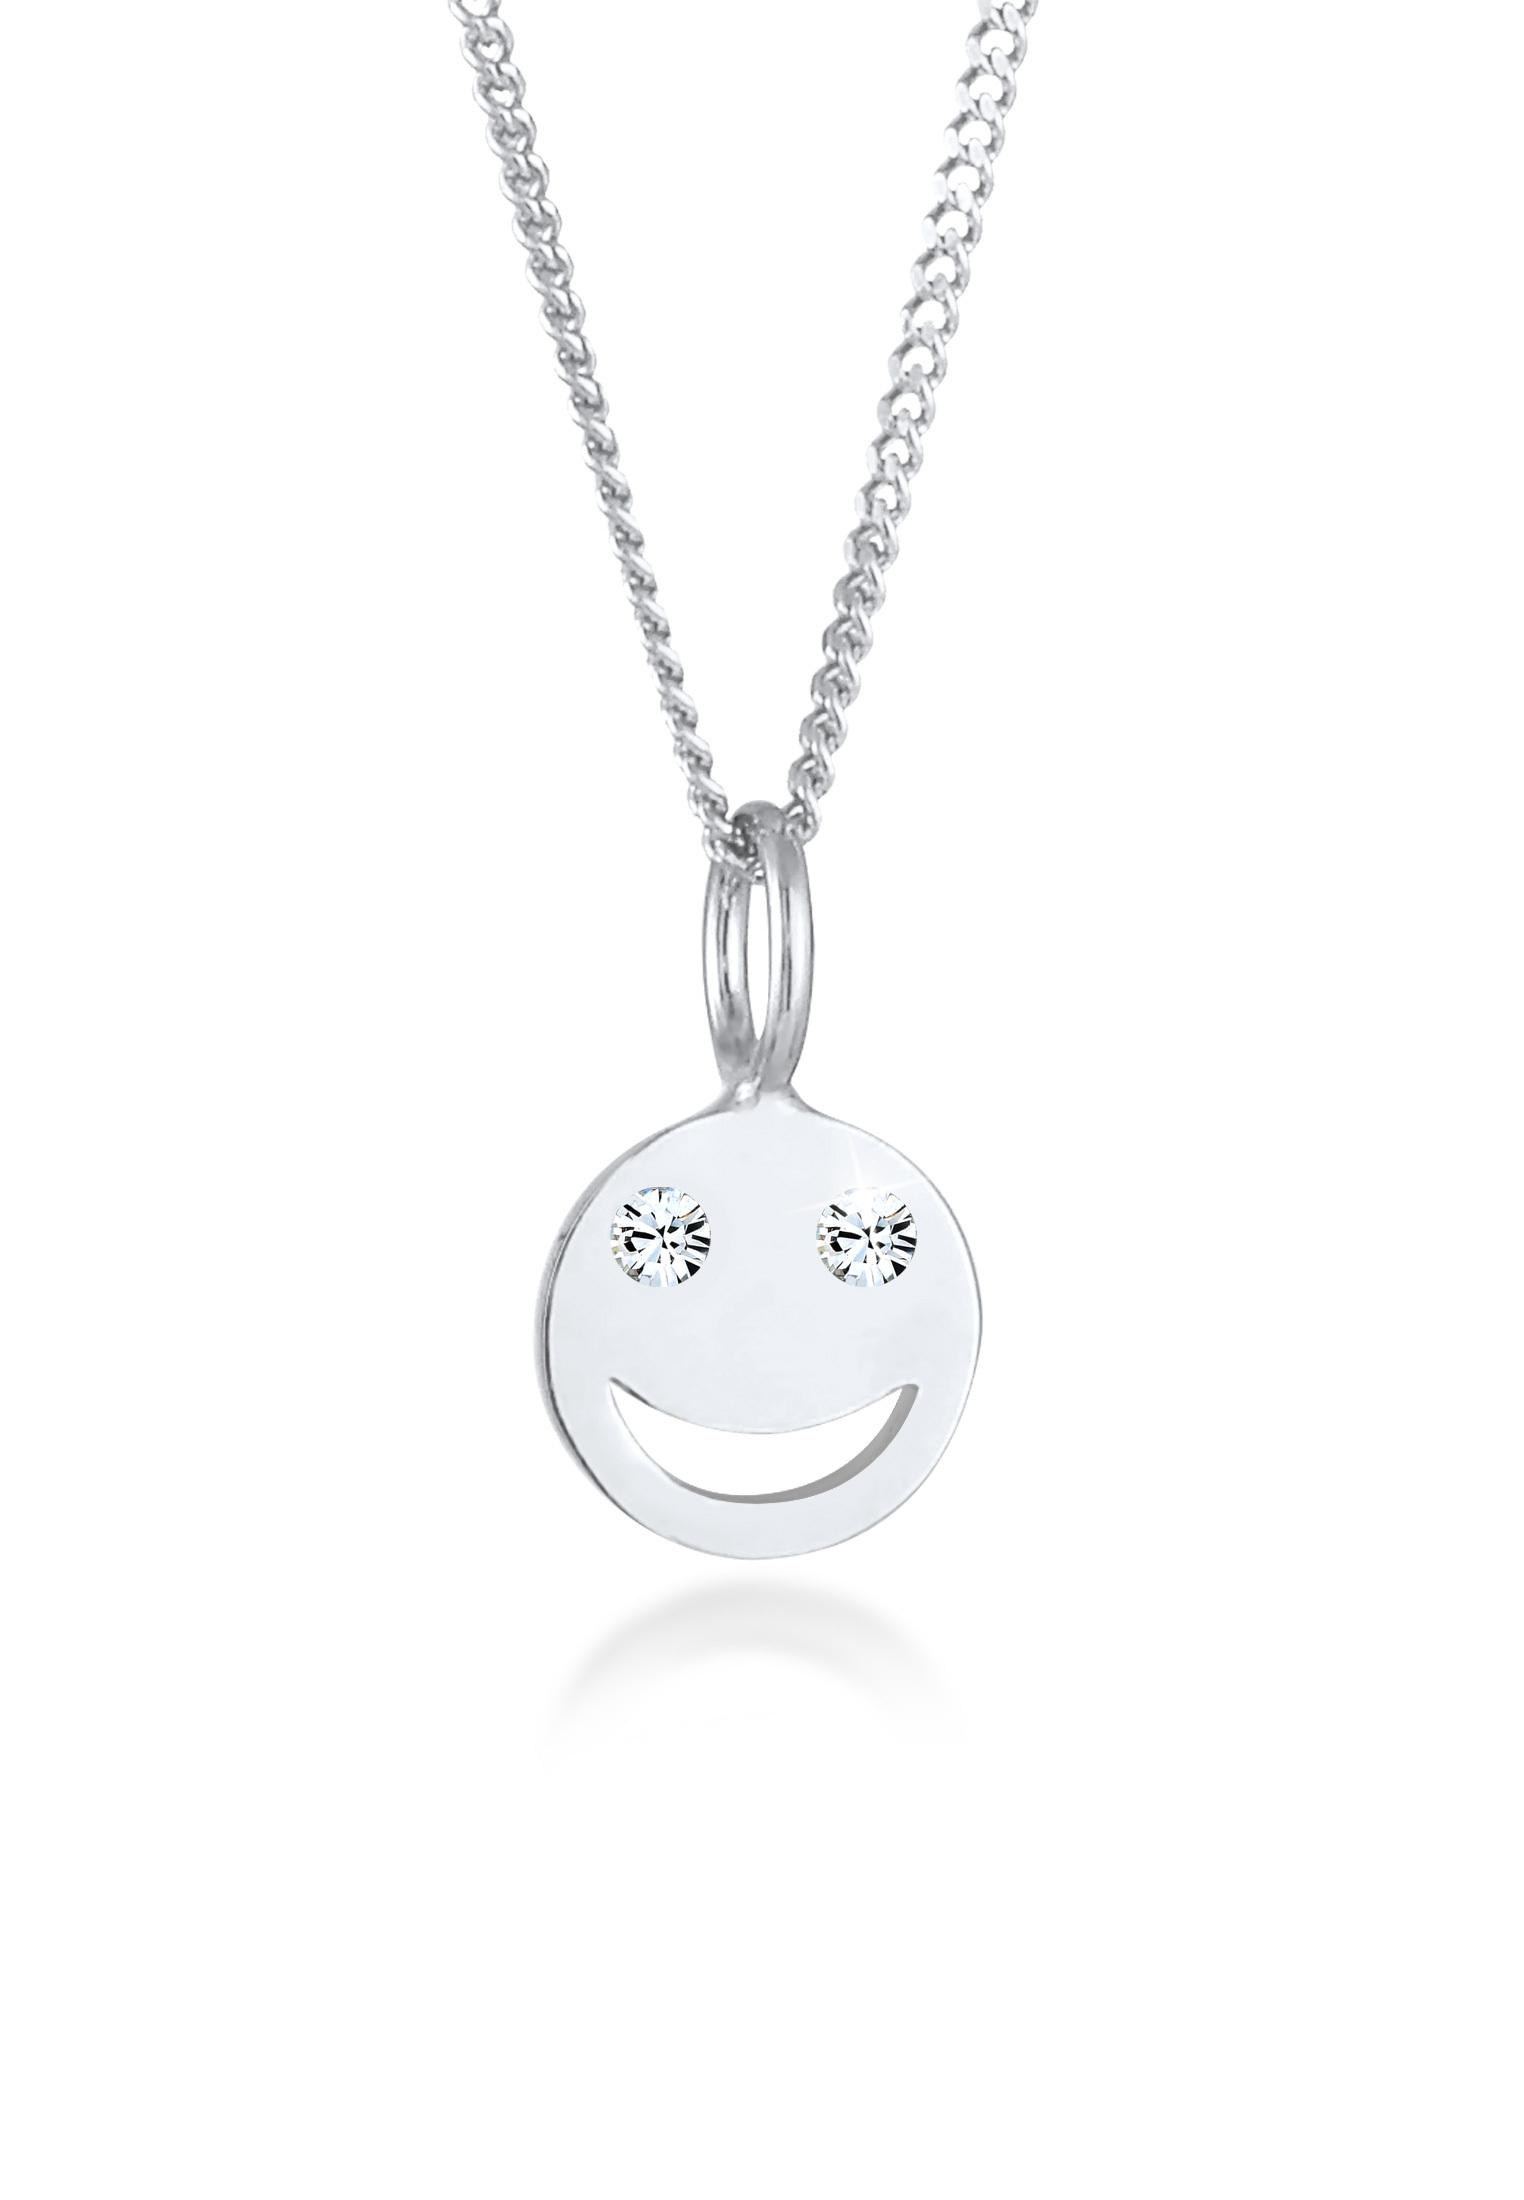 Halskette Smiley | Kristall ( Weiß ) | 925er Sterling Silber